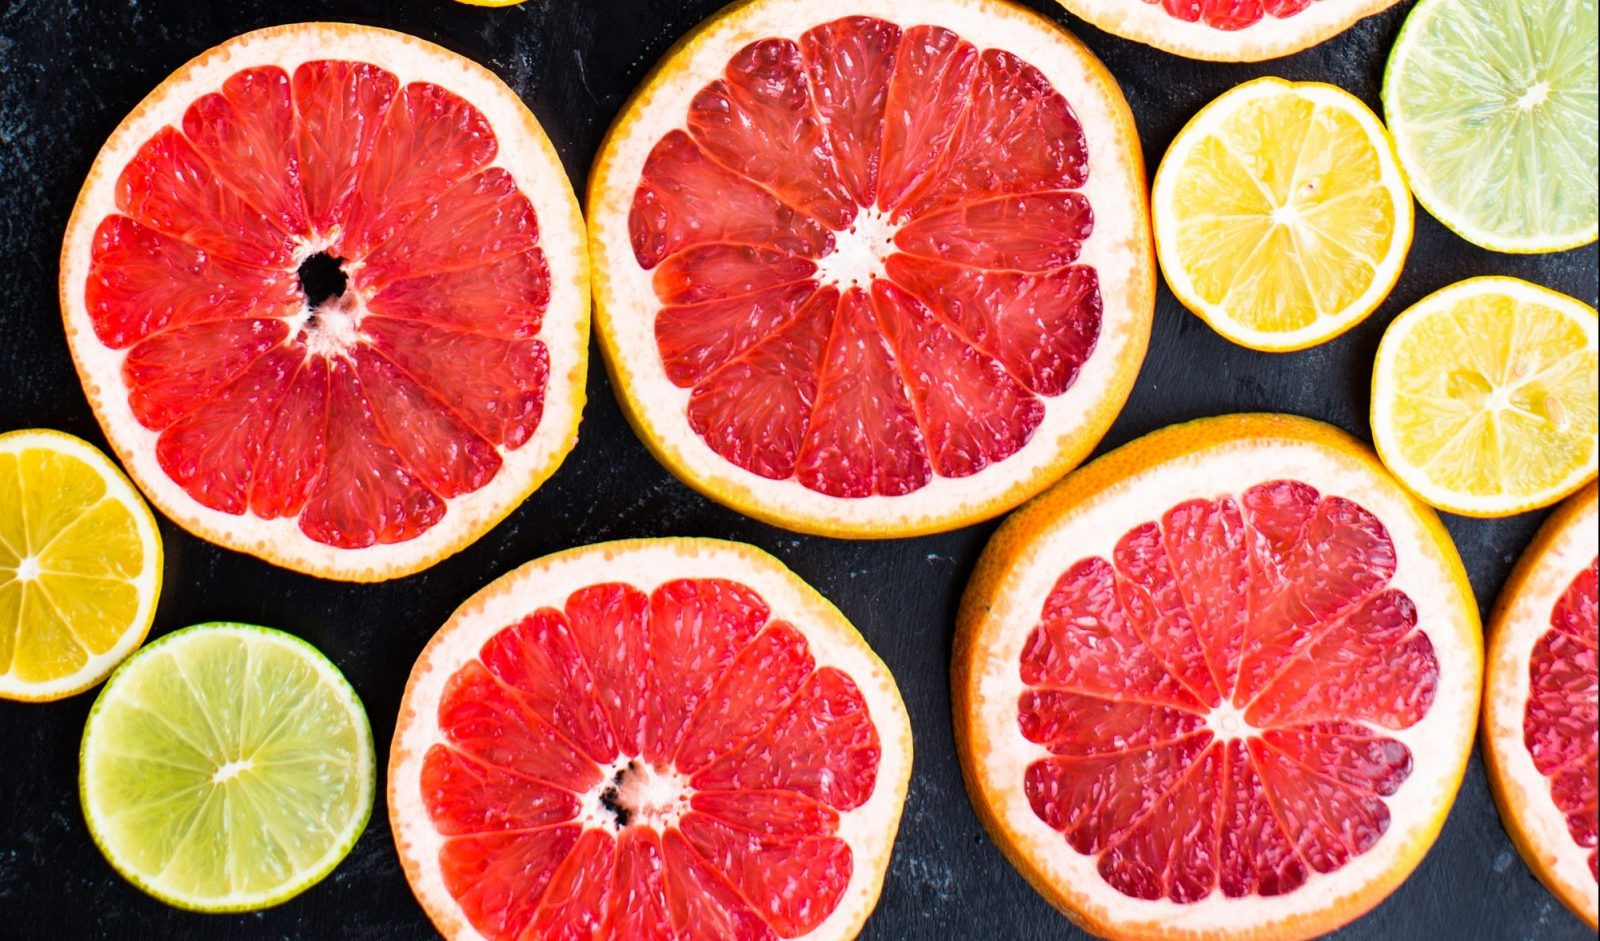 sliced citrus fruit, lemon, lime, blood orange